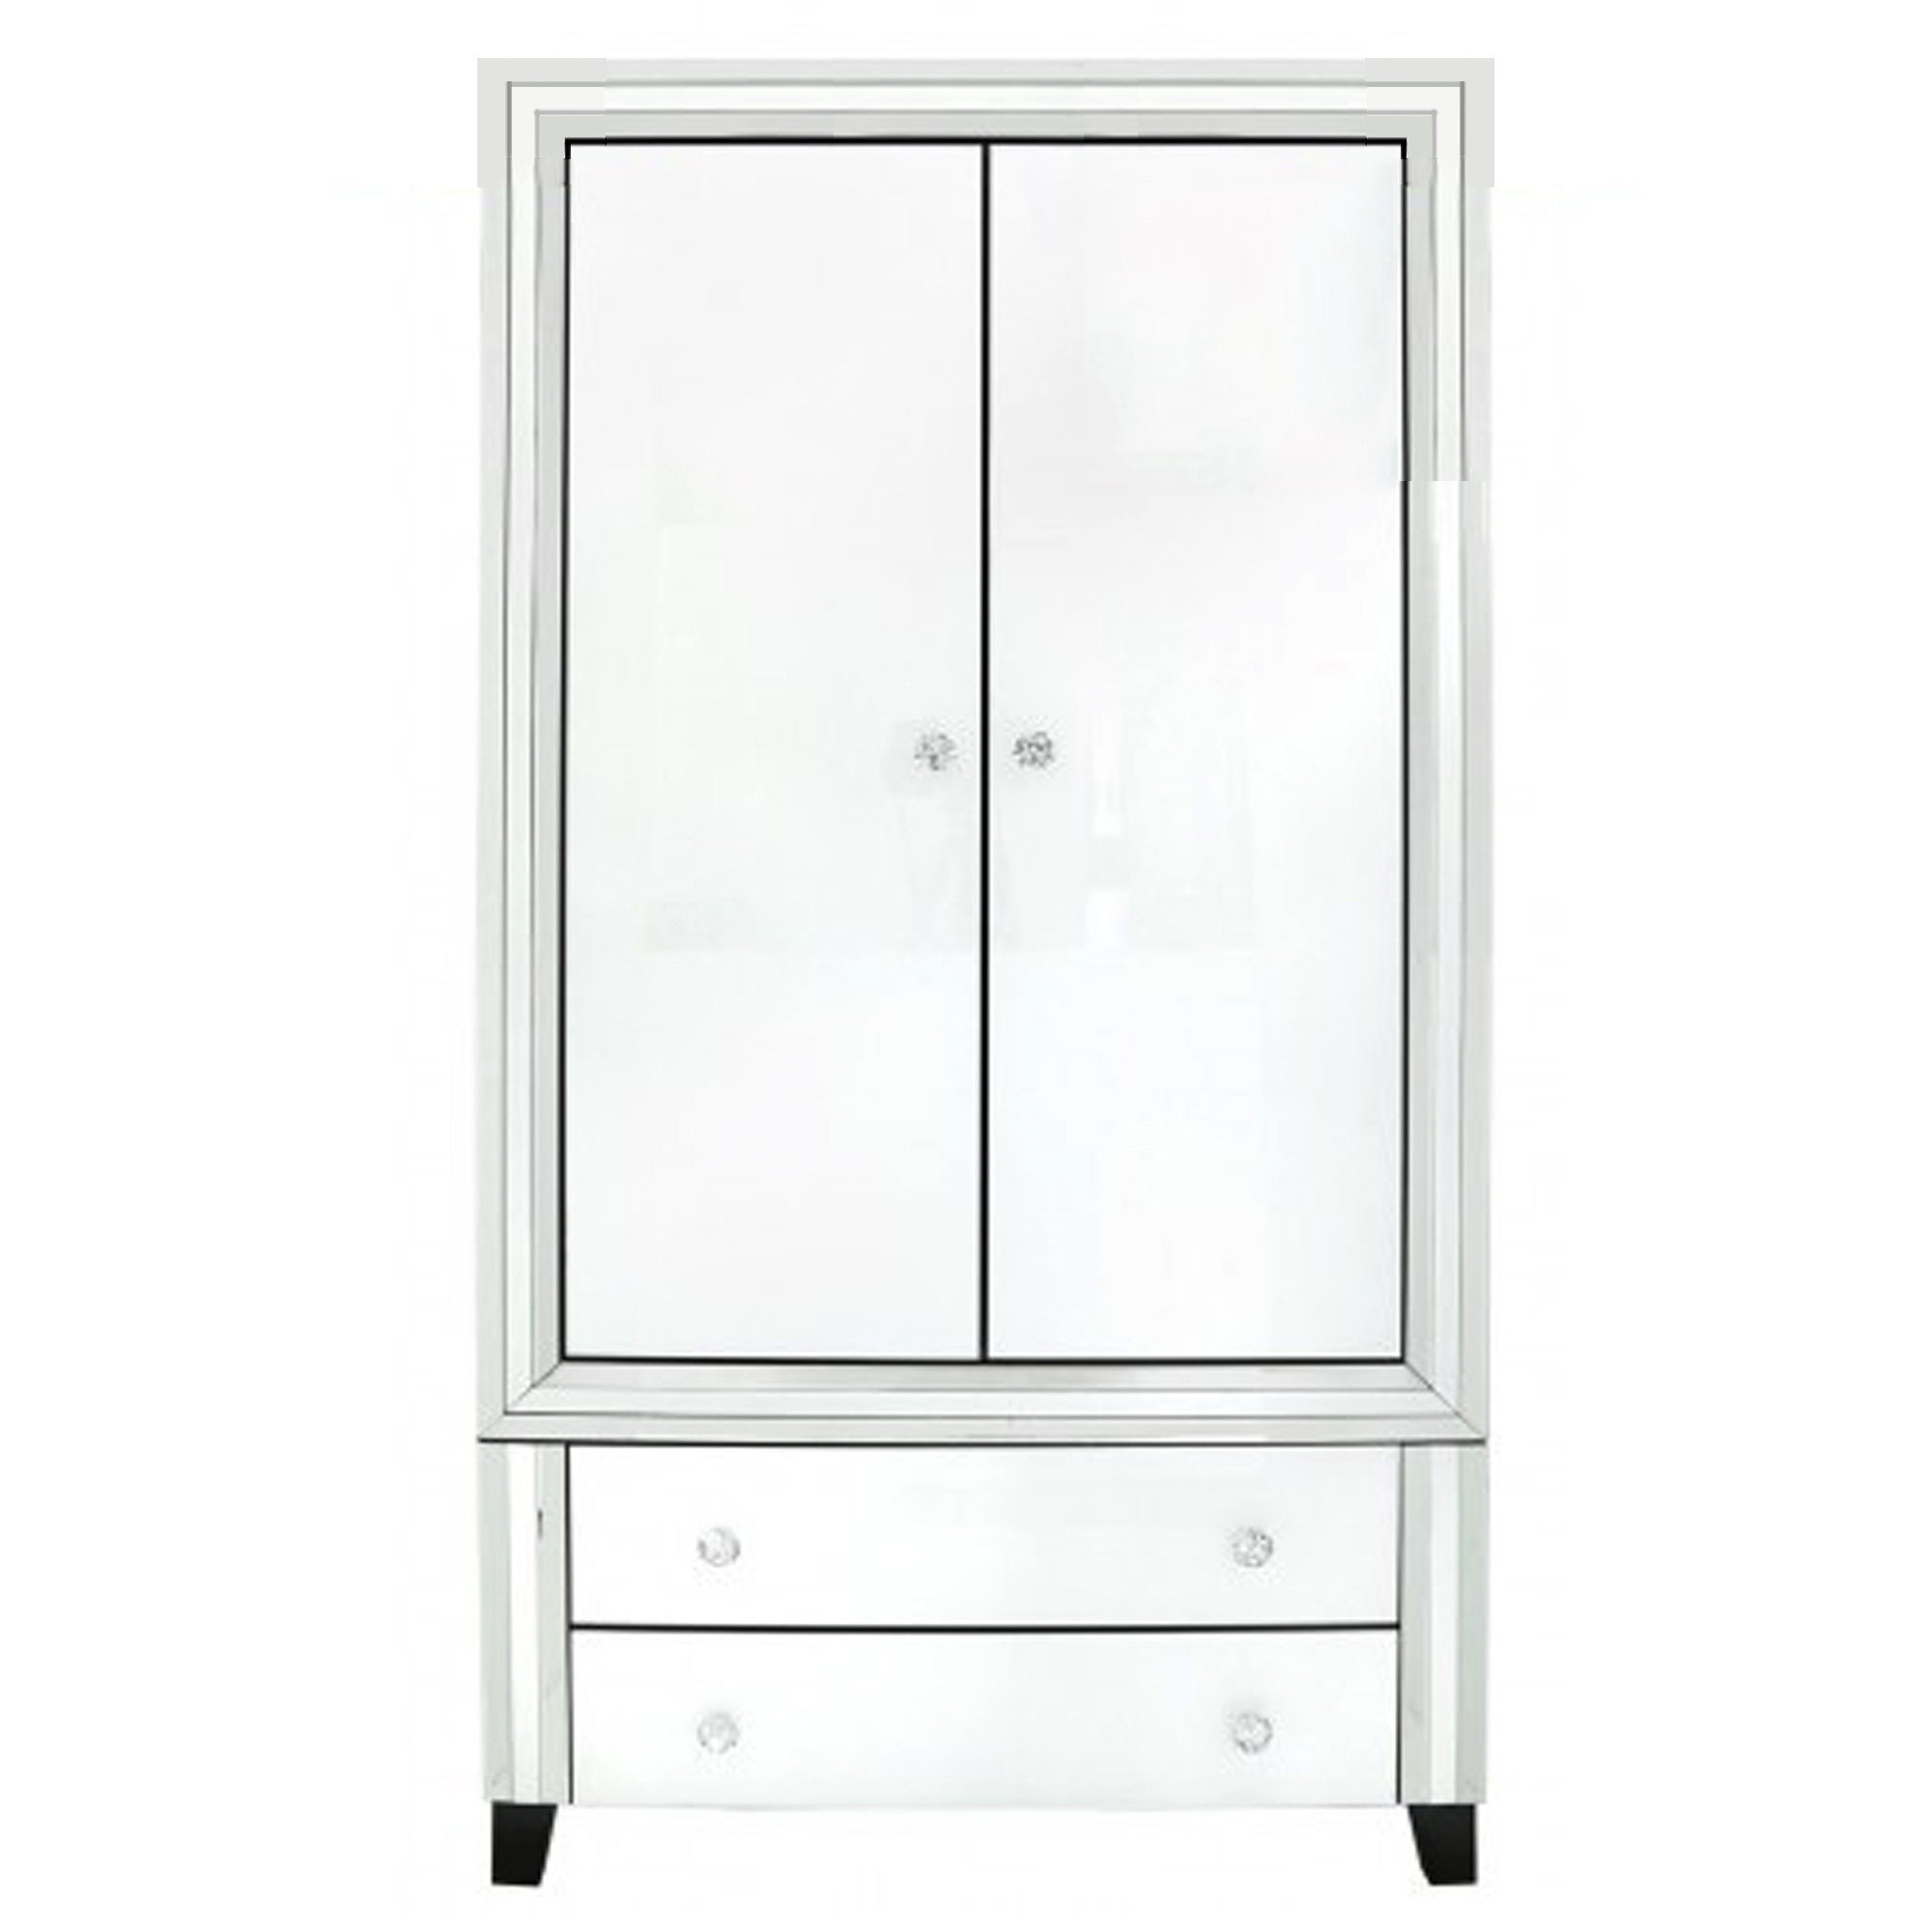 buy online d7c95 e2565 Hill Product 1